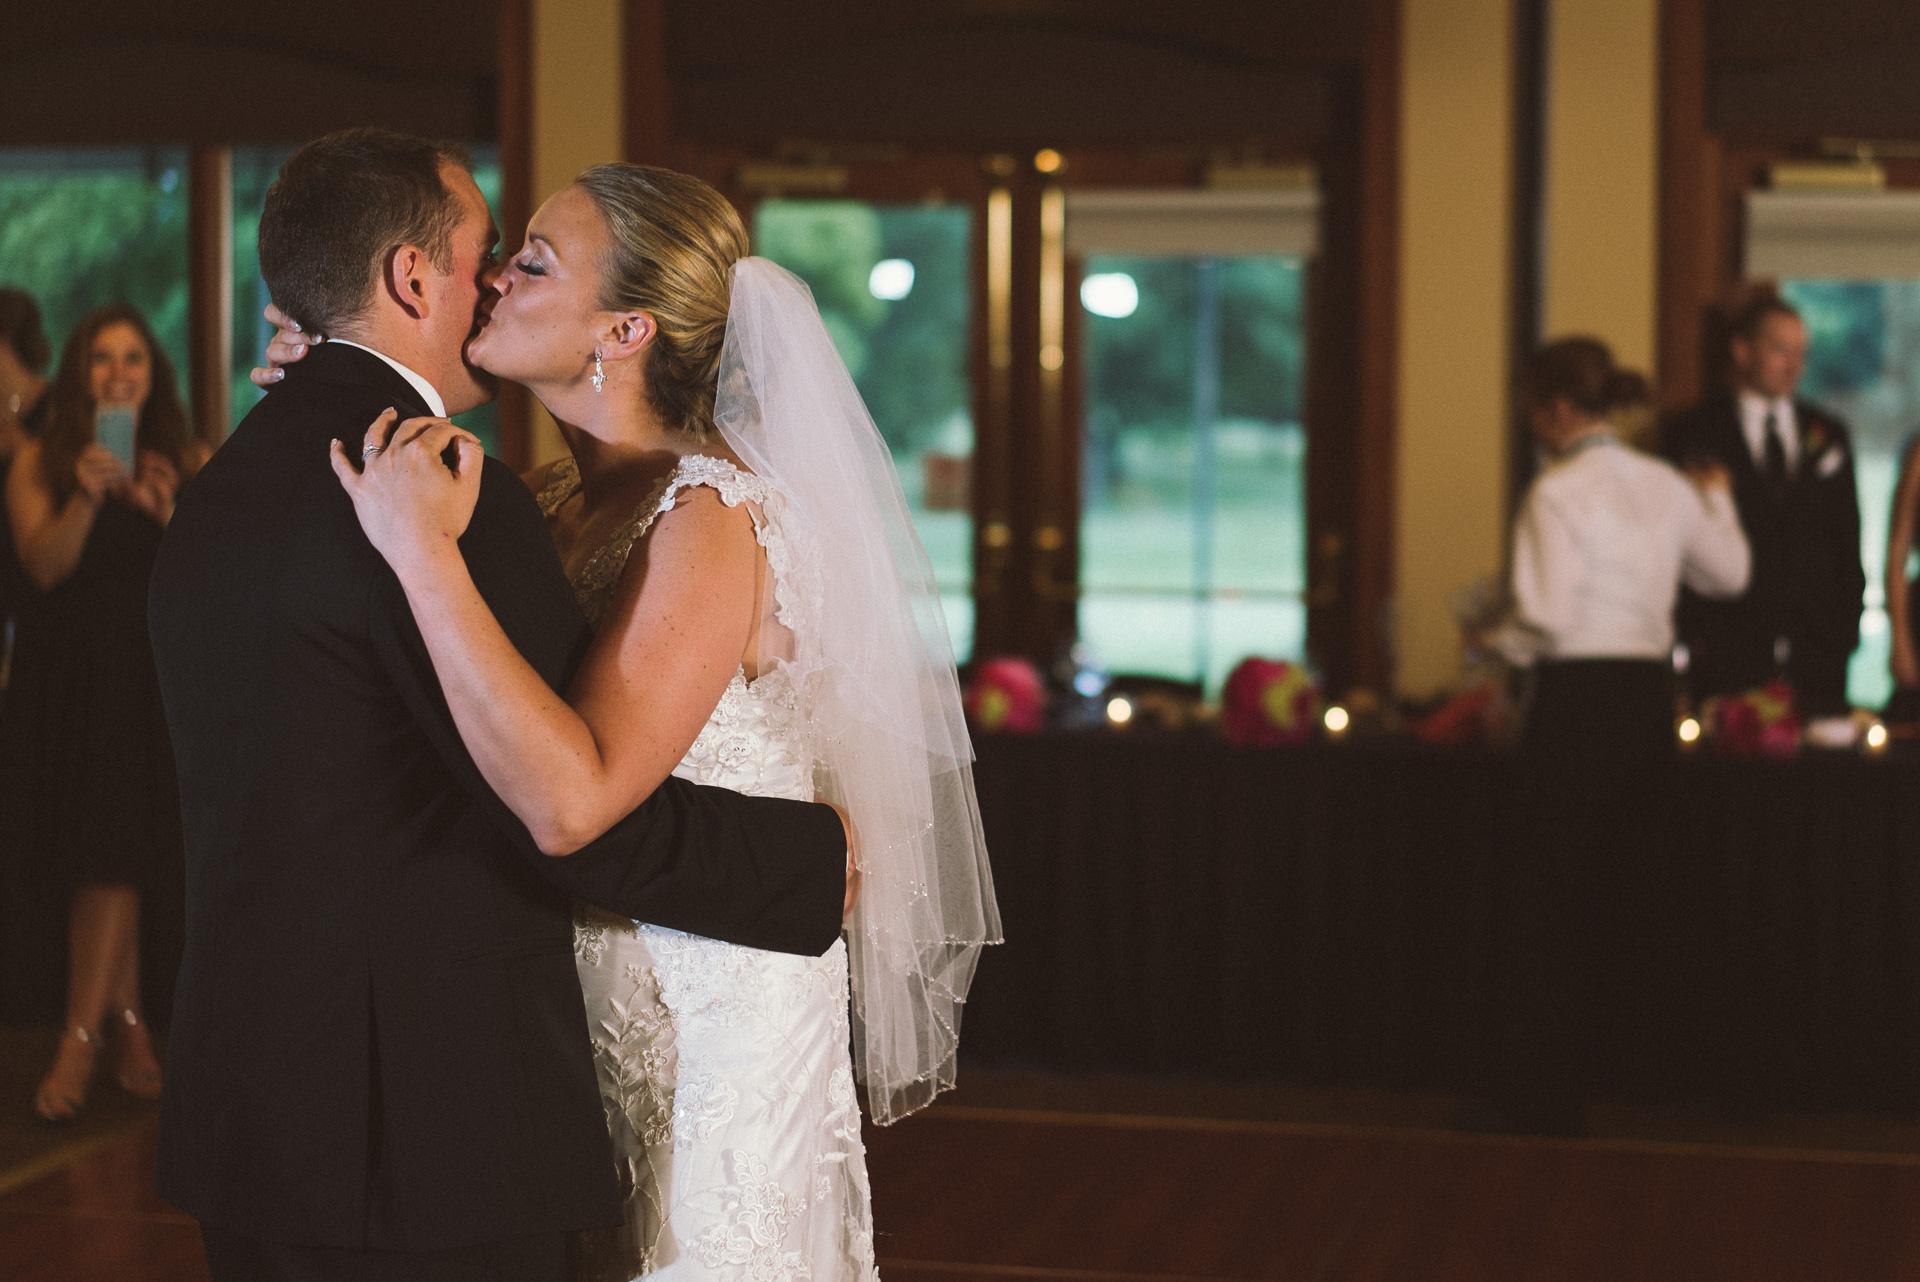 Dayton Wedding Photographer - First Dance